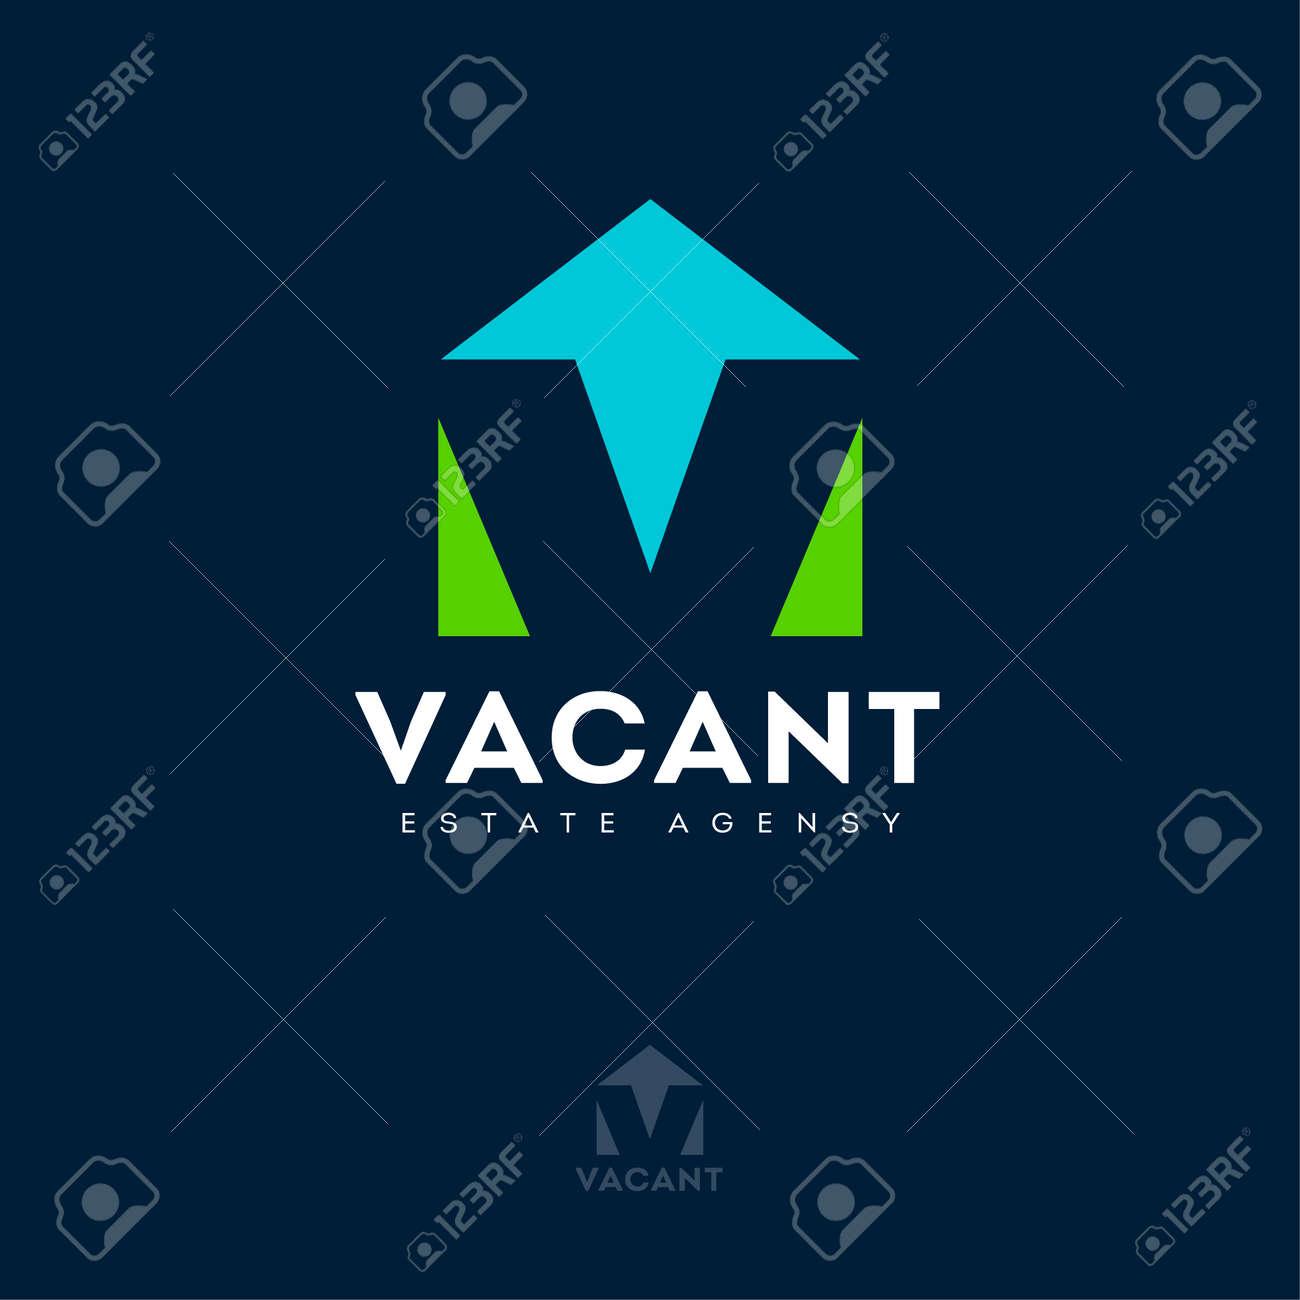 Vacant logo with optical illusion. V letter, monogram like house silhouette. Logo for Estate Agency, Rental Property, Real Estate logo. - 168024377